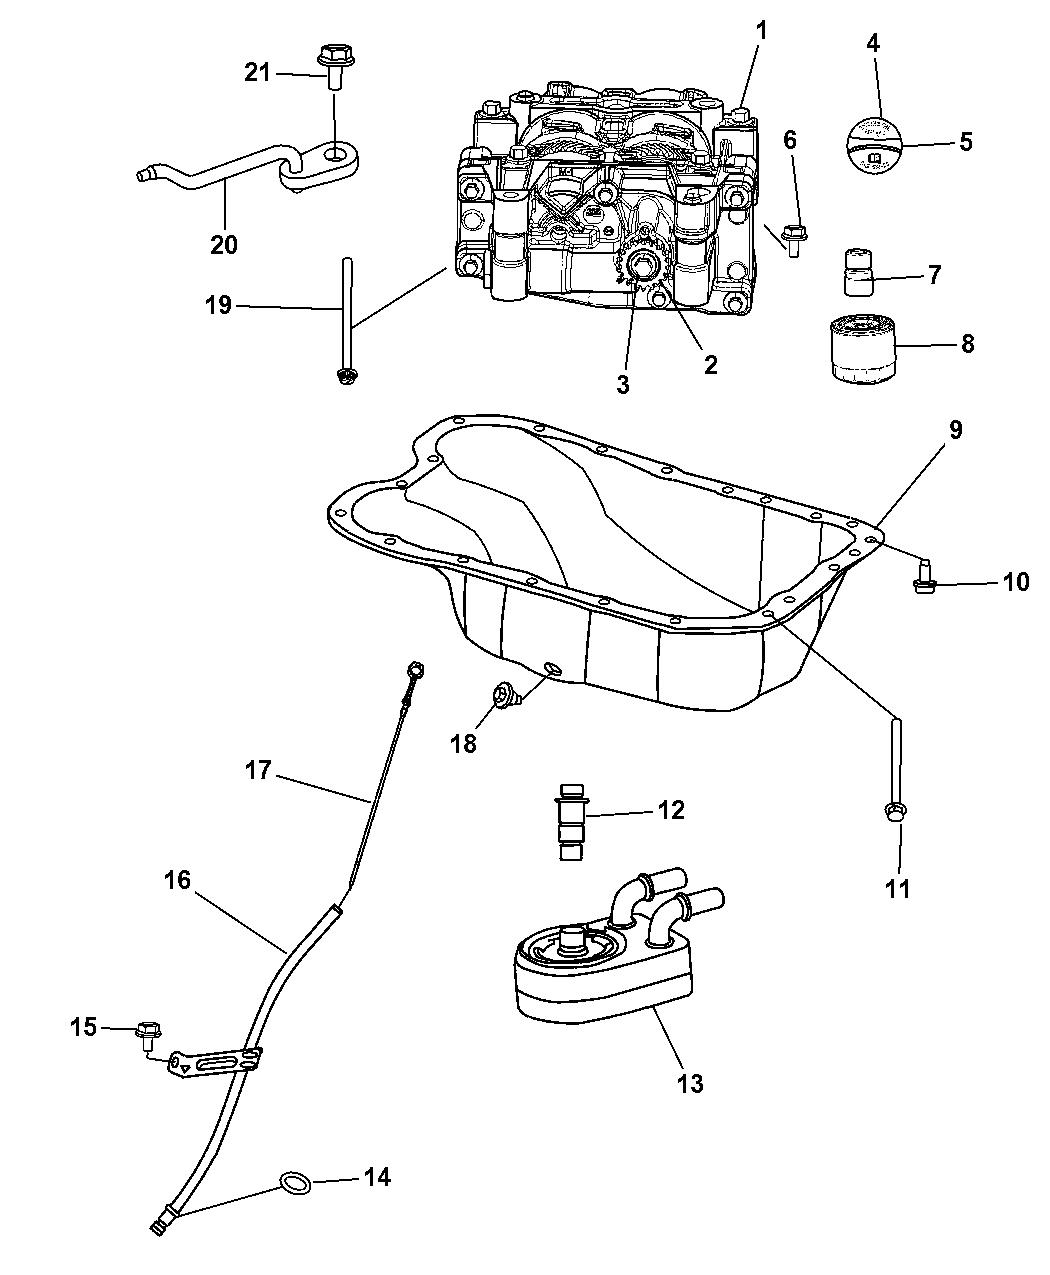 Jpeg Image Sirius Wiring Diagram For The Jeep Liberty Kj